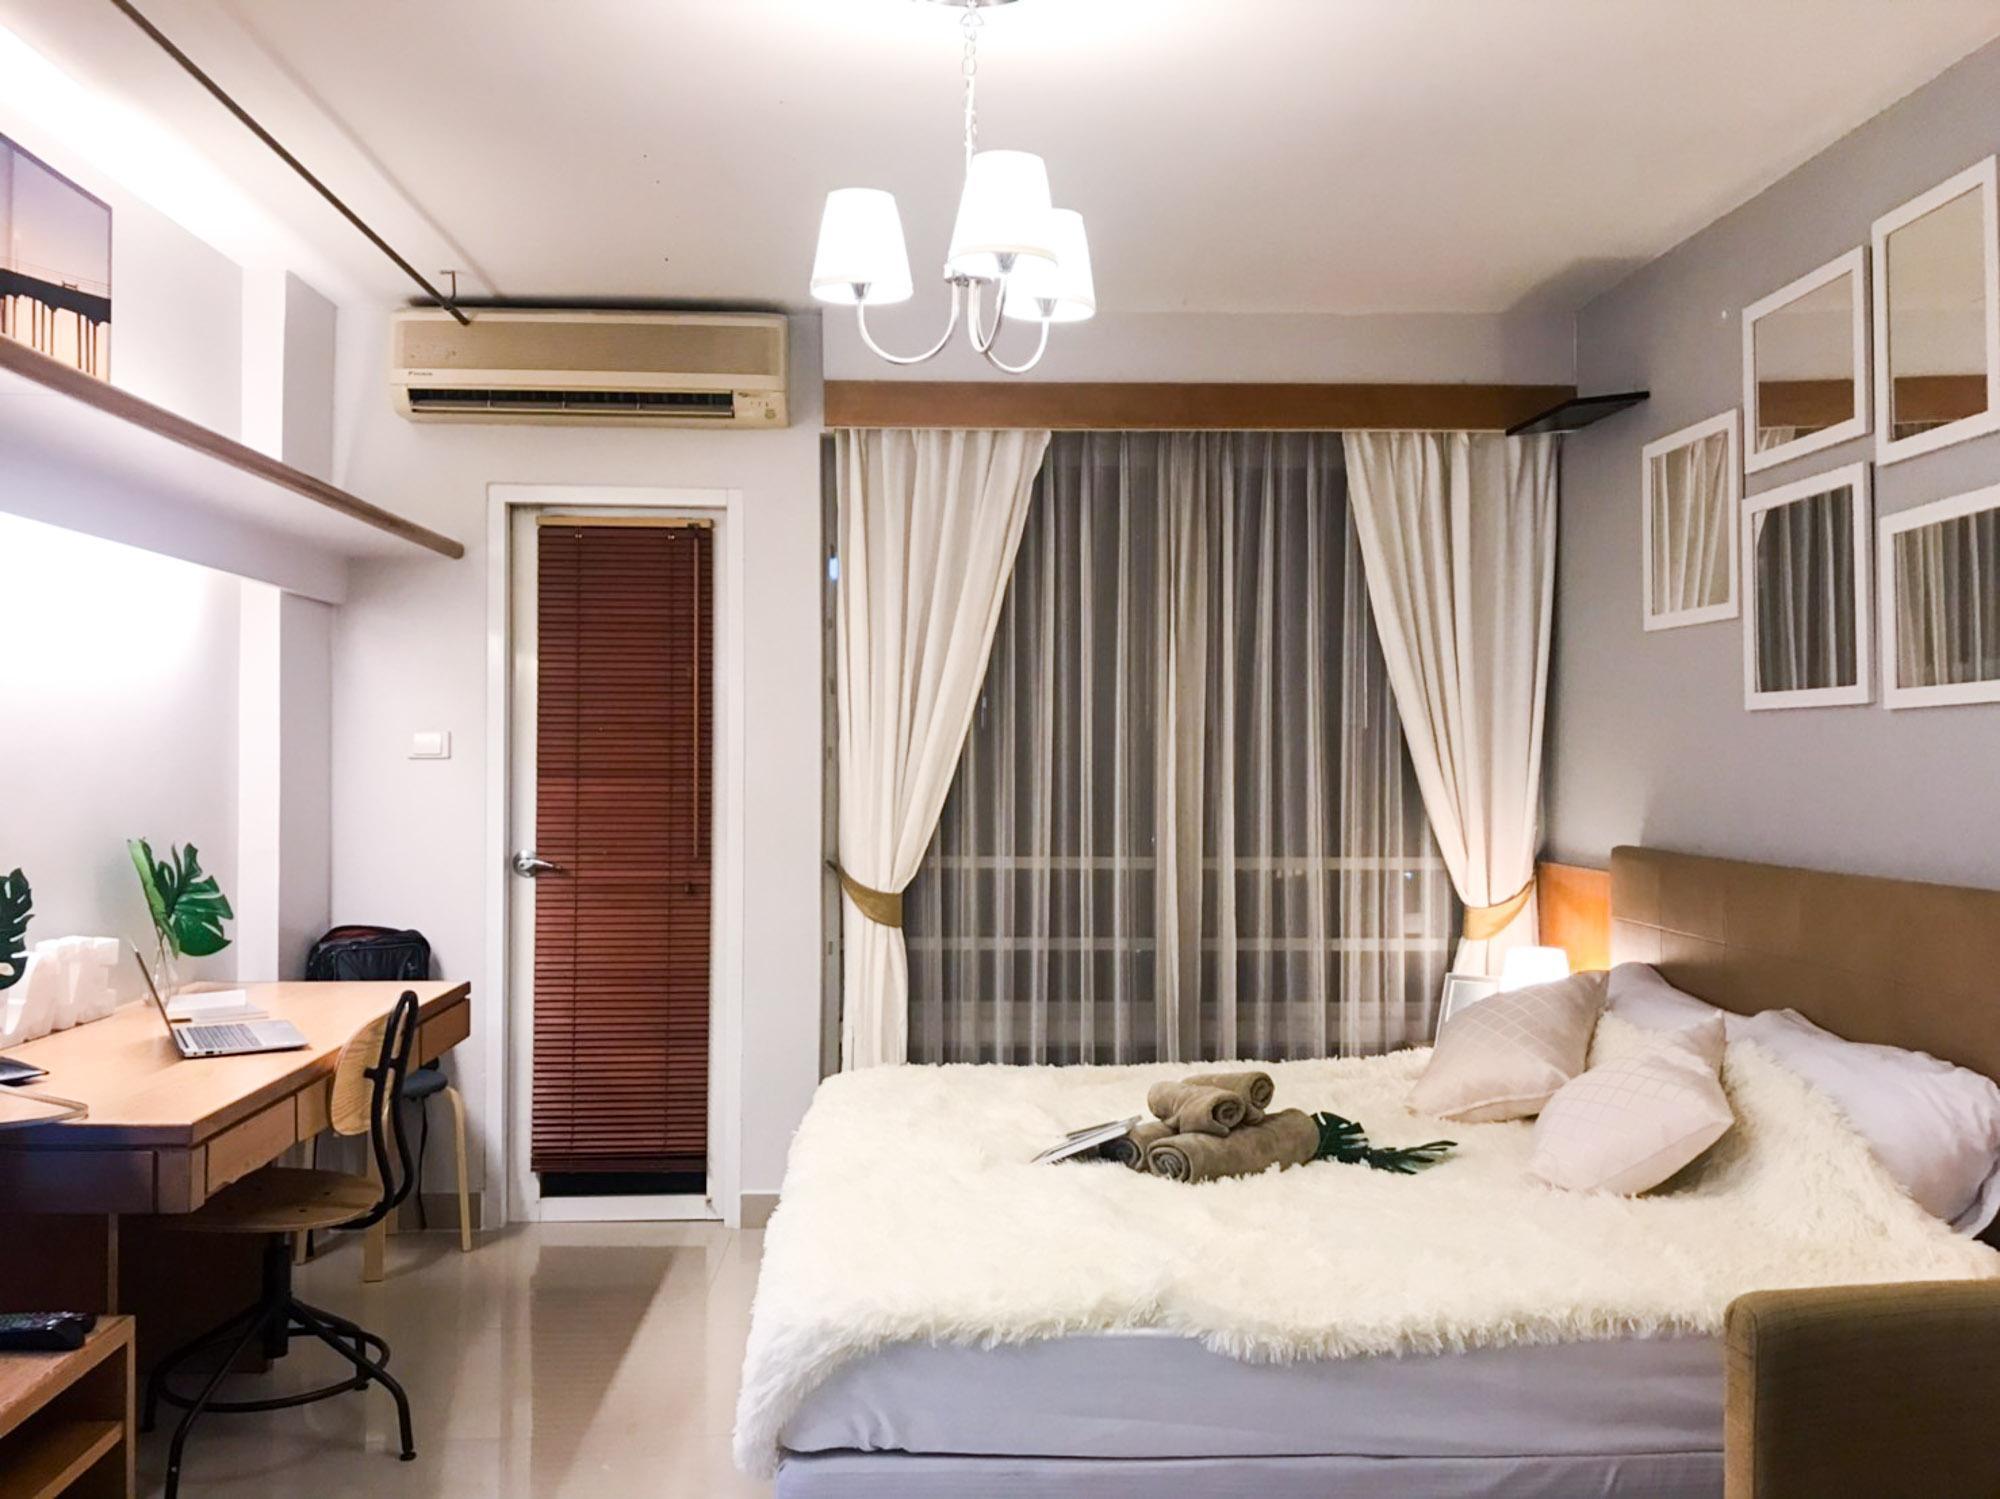 Cozy room[B], Super Convenient - Few Steps to RCA! สตูดิโอ อพาร์ตเมนต์ 1 ห้องน้ำส่วนตัว ขนาด 26 ตร.ม. – รัชดาภิเษก